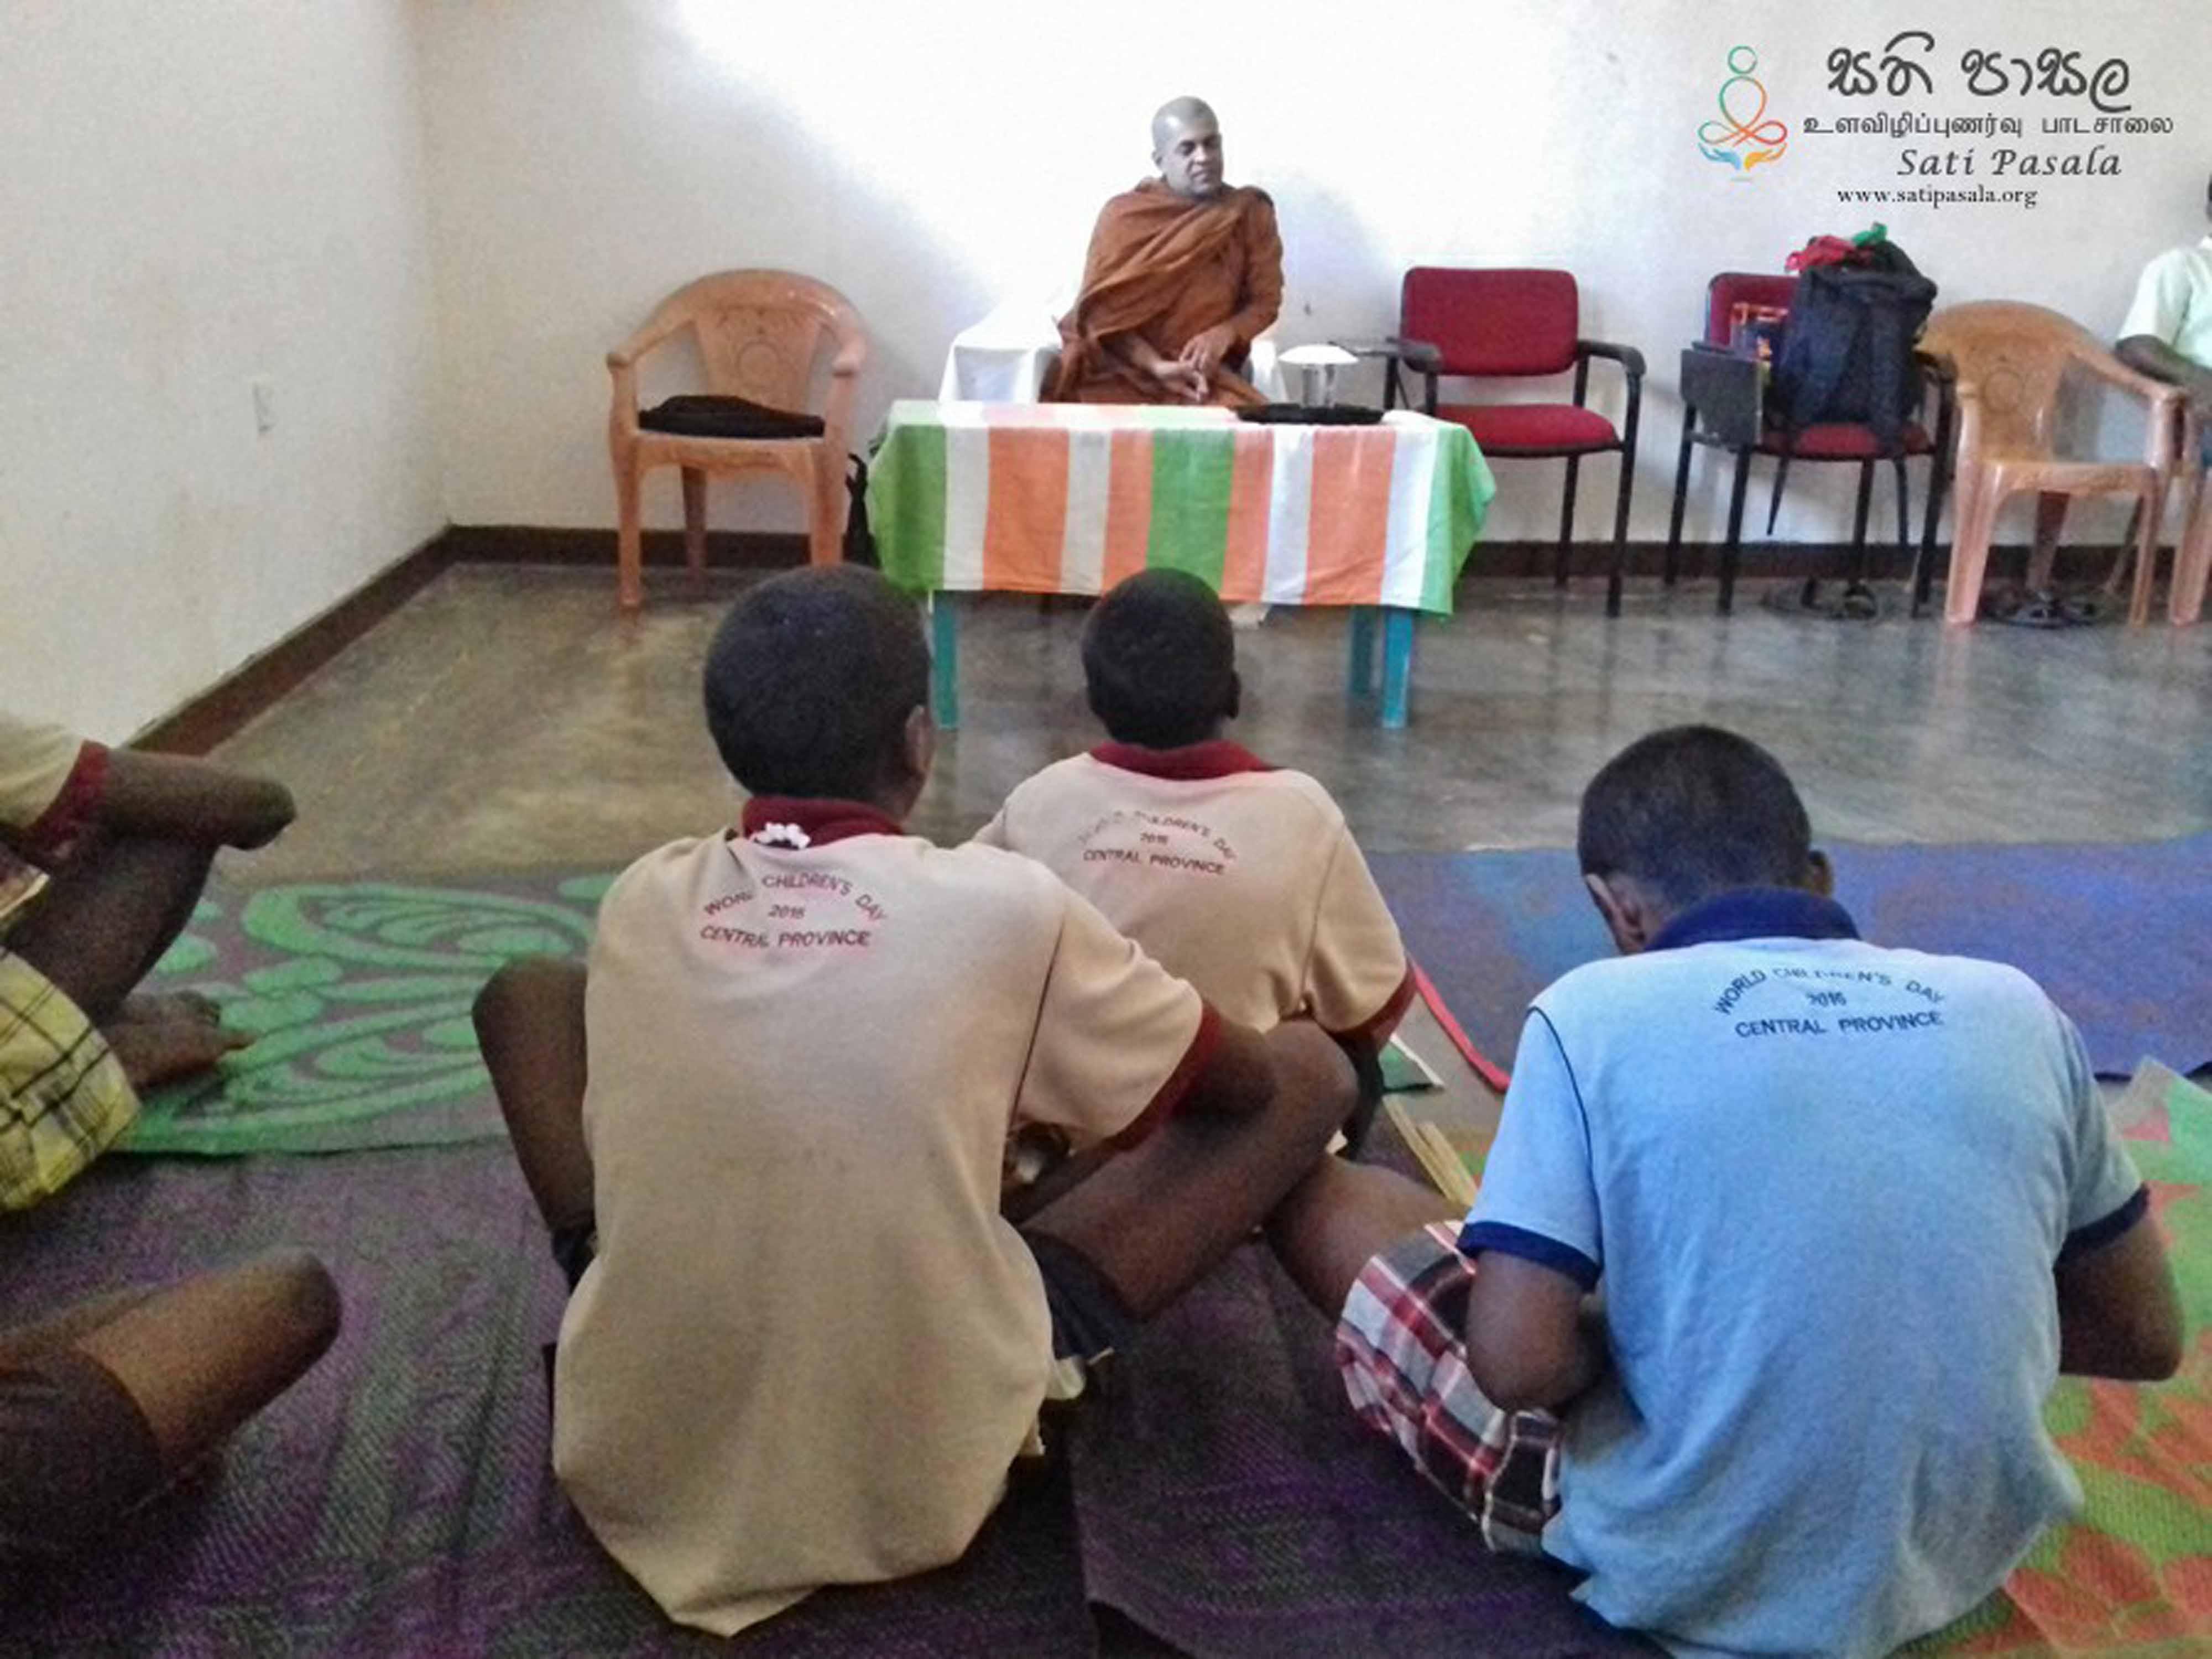 Sati Pasala Programme at Childrens Remand Home, Bambaradeniya